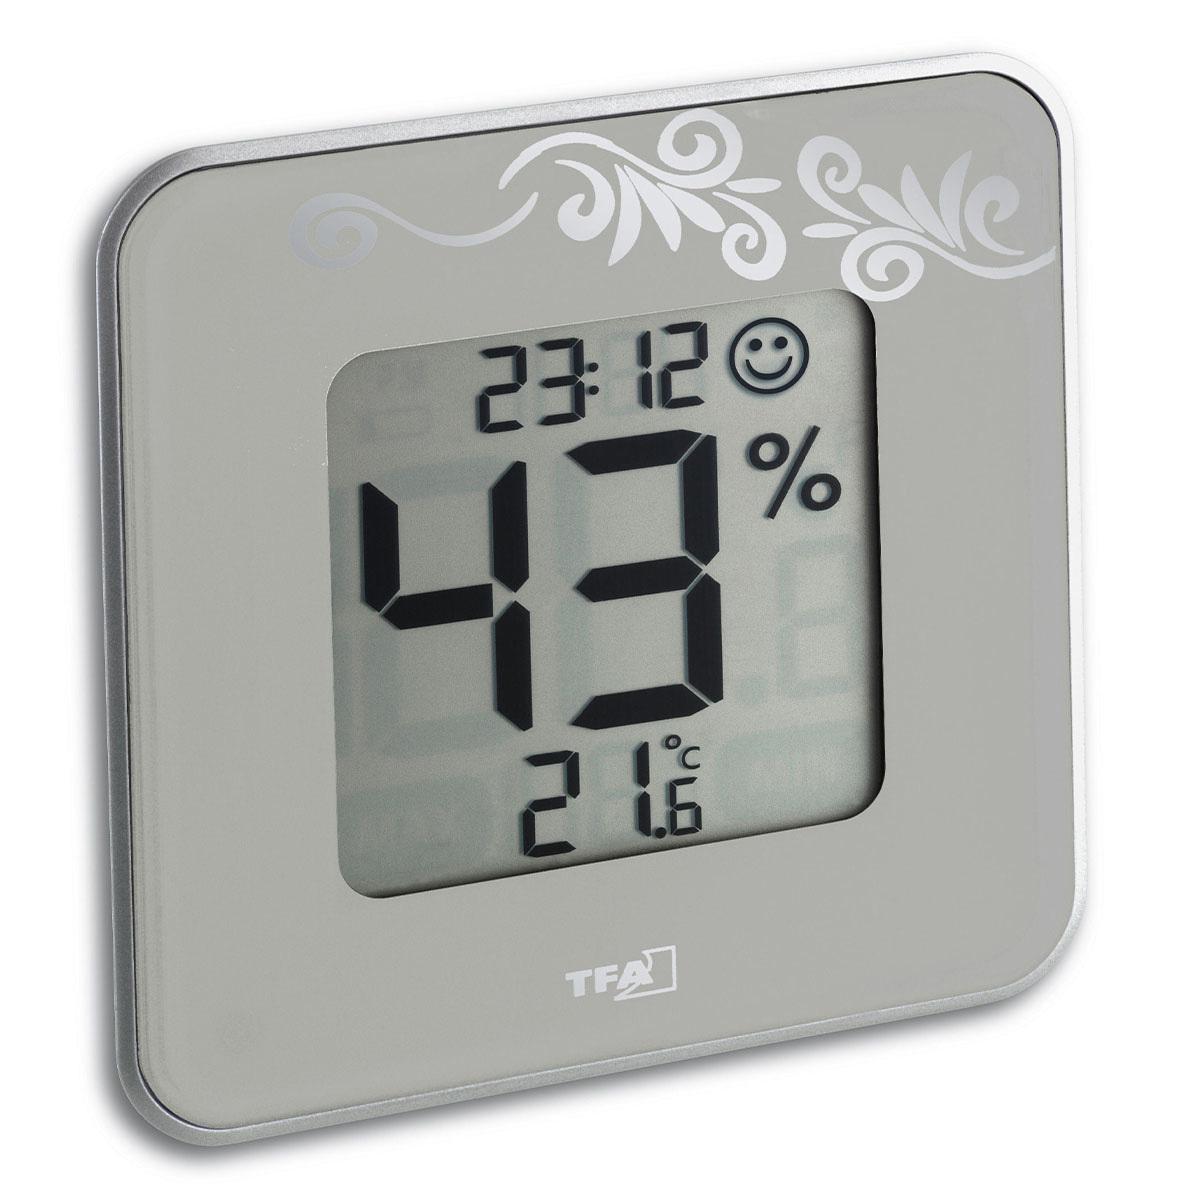 30-5021-02-digitales-thermo-hygrometer-stlye-1200x1200px.jpg